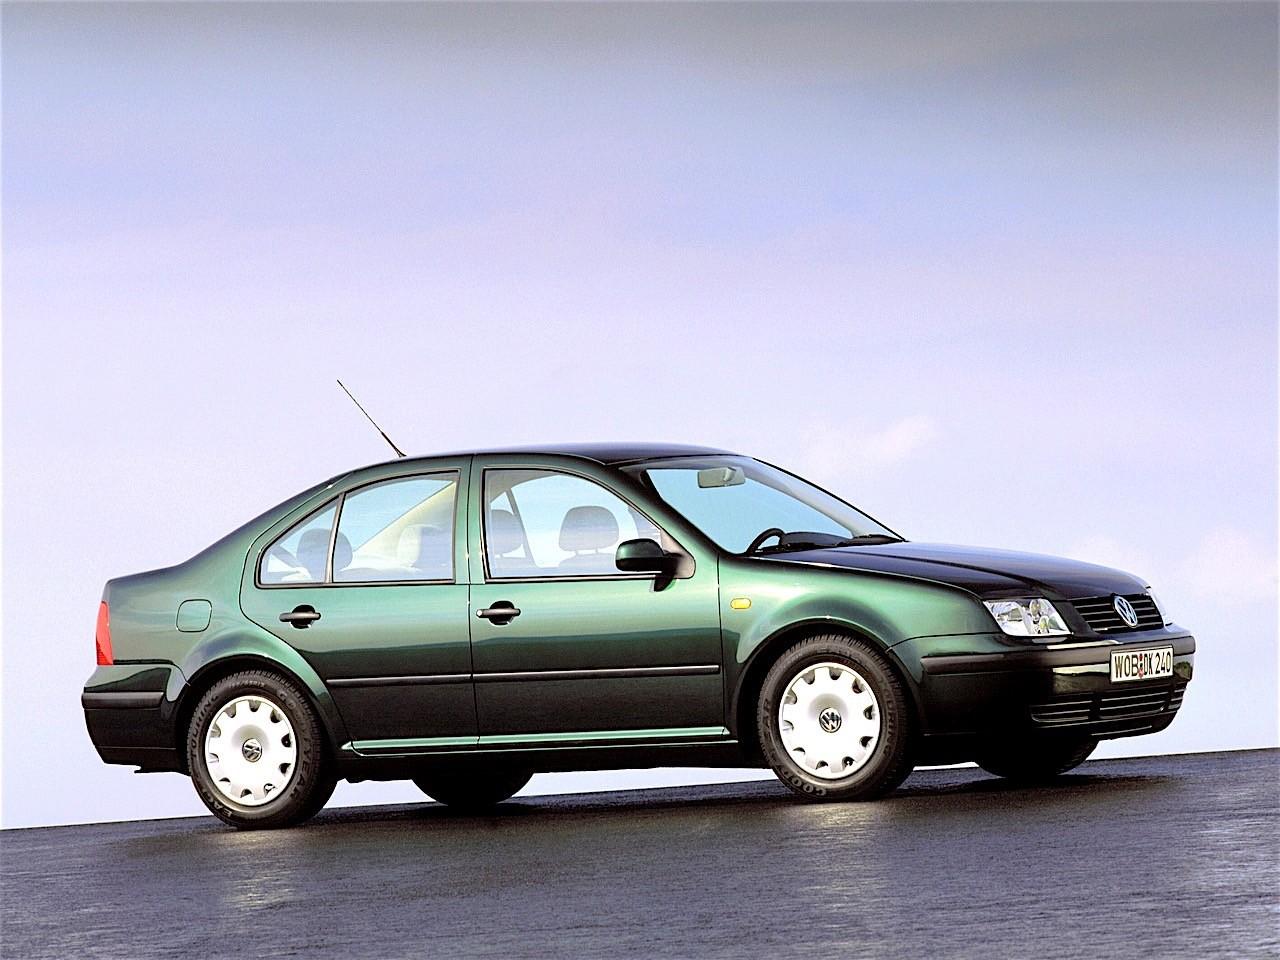 VOLKSWAGEN Bora - 1998, 1999, 2000, 2001, 2002, 2003, 2004, 2005 - autoevolution